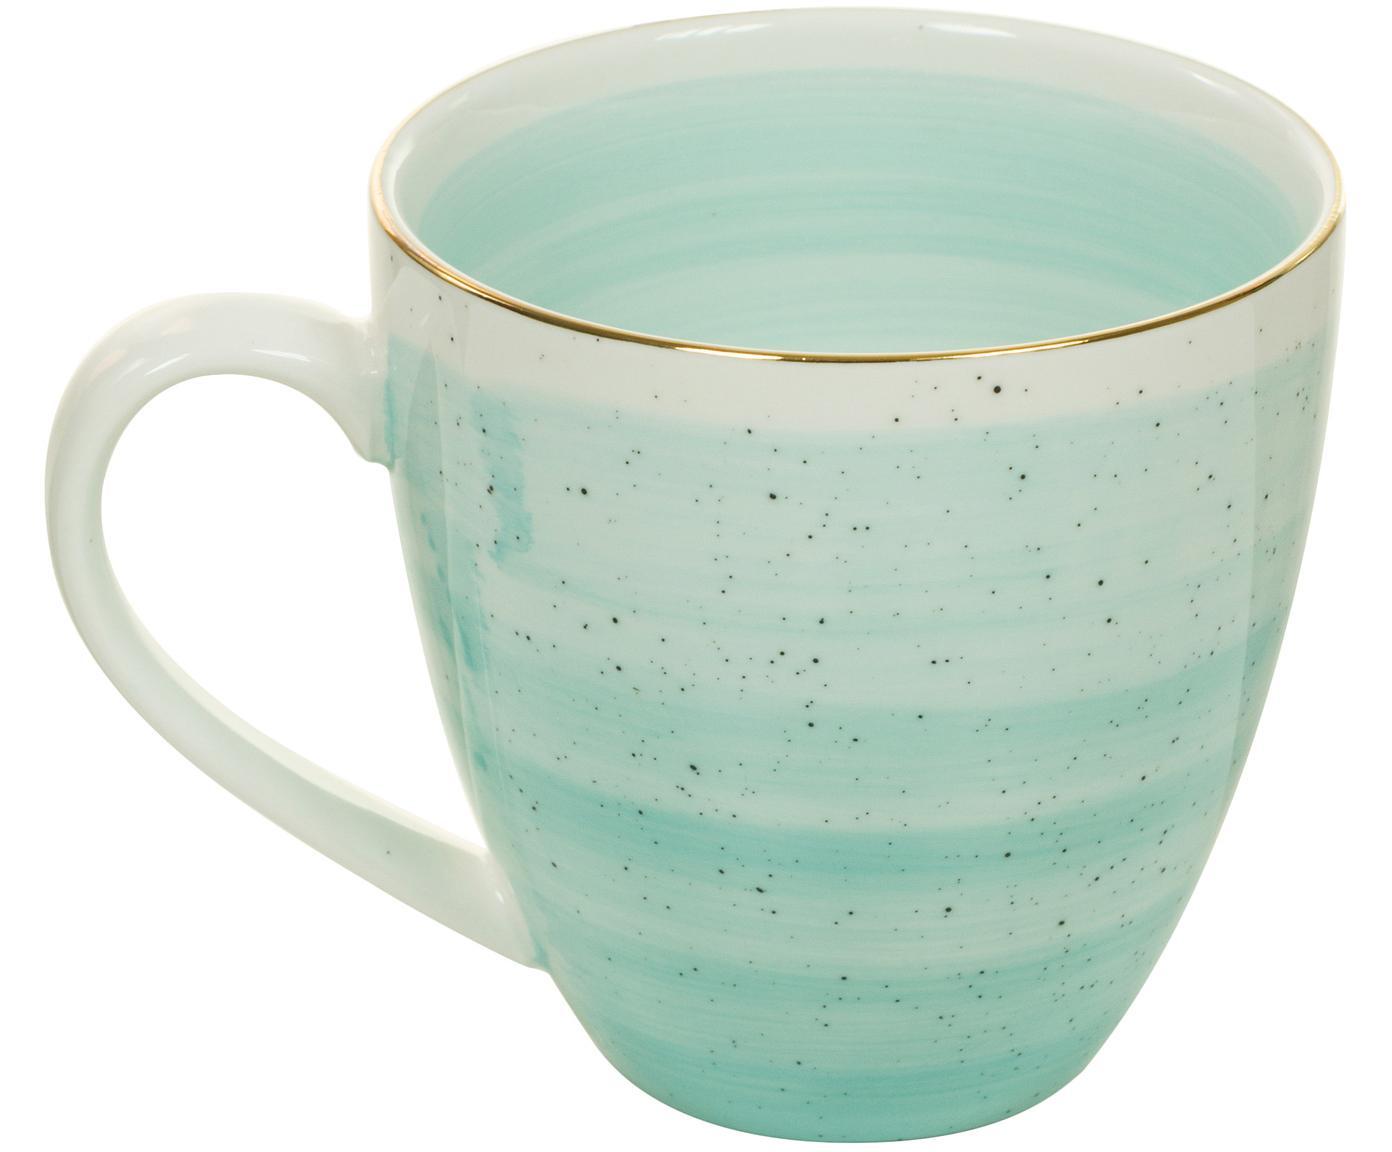 Tazas café artesanales Bol, 2uds., Porcelana, Azul turquesa, Ø 9 x Al 9 cm